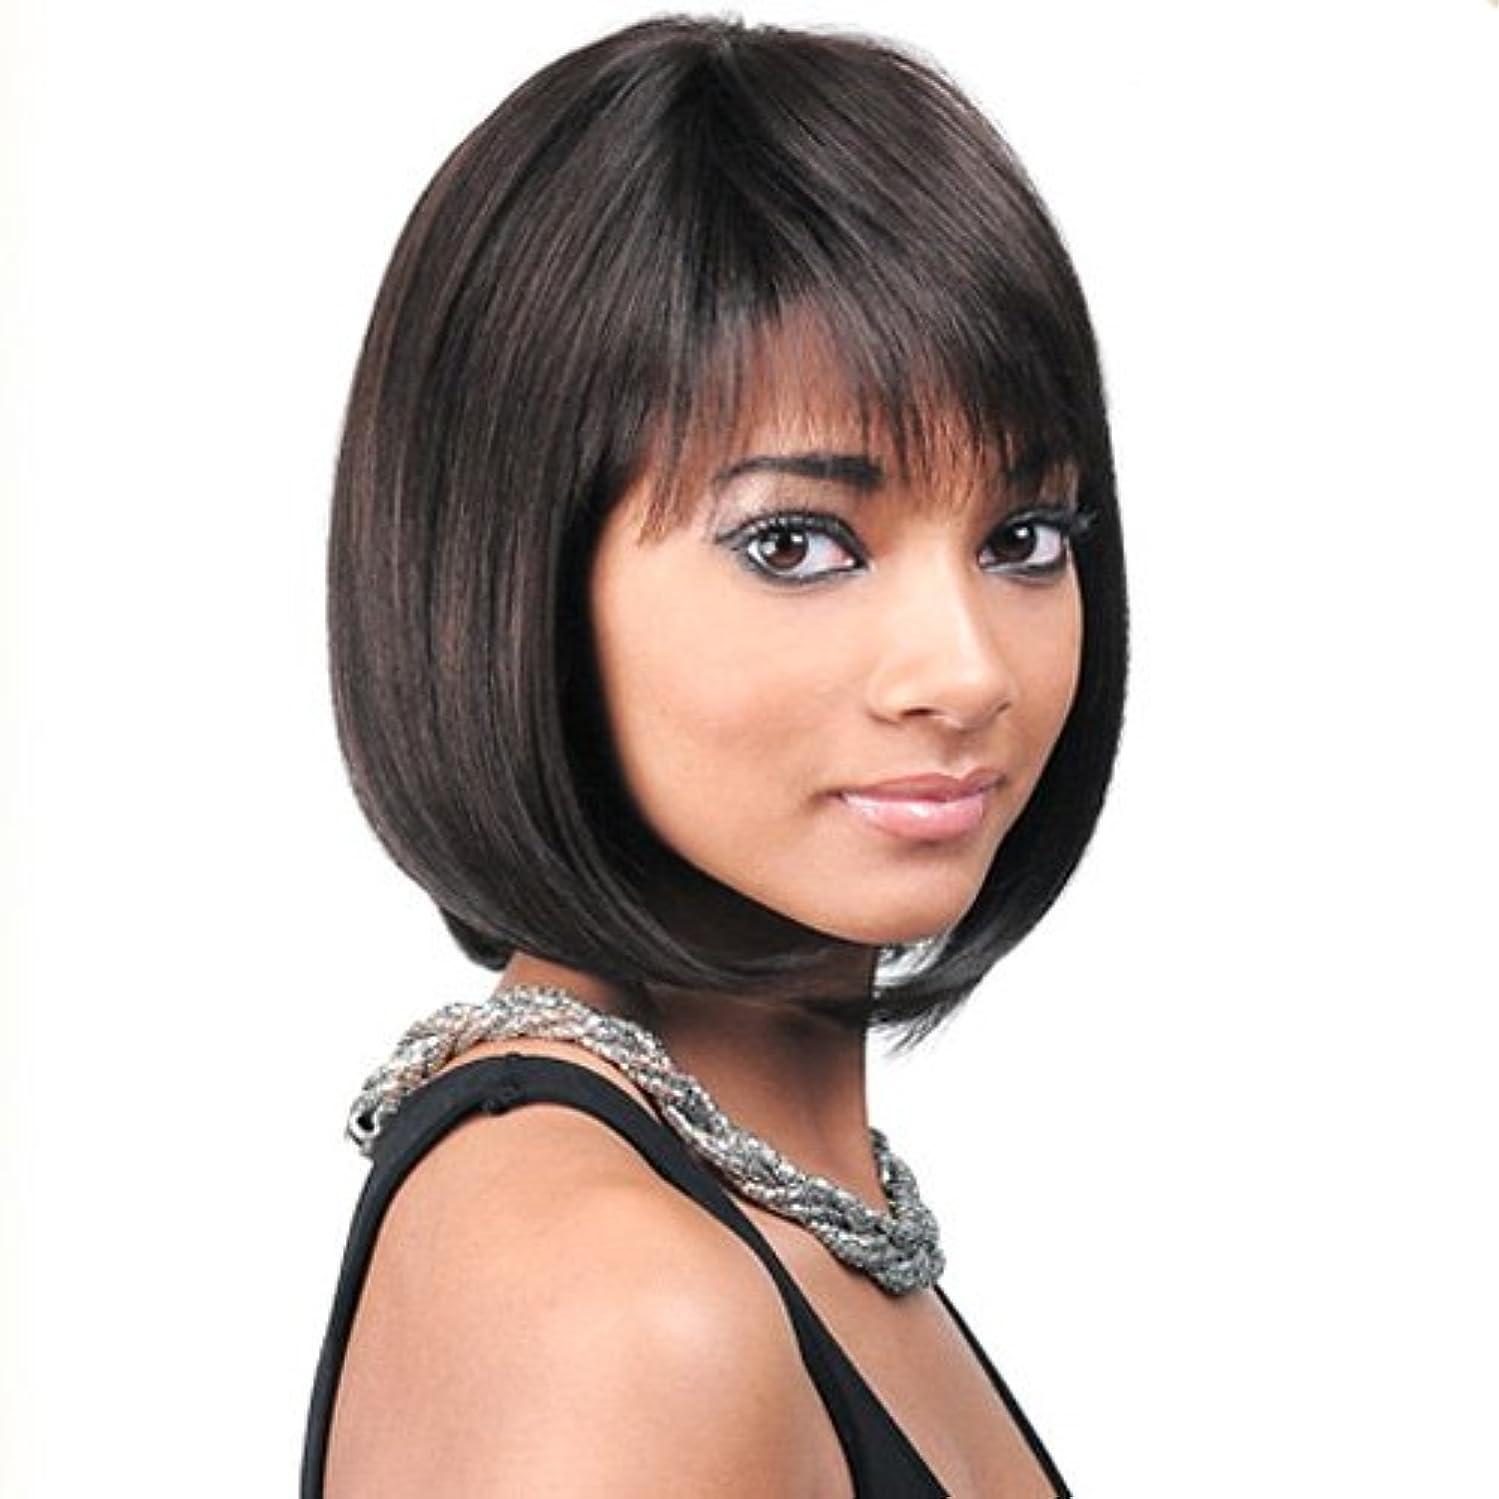 JUNEE FASHION Remi Human Hair Wig - REMI H VERA (#1B - Off Black)